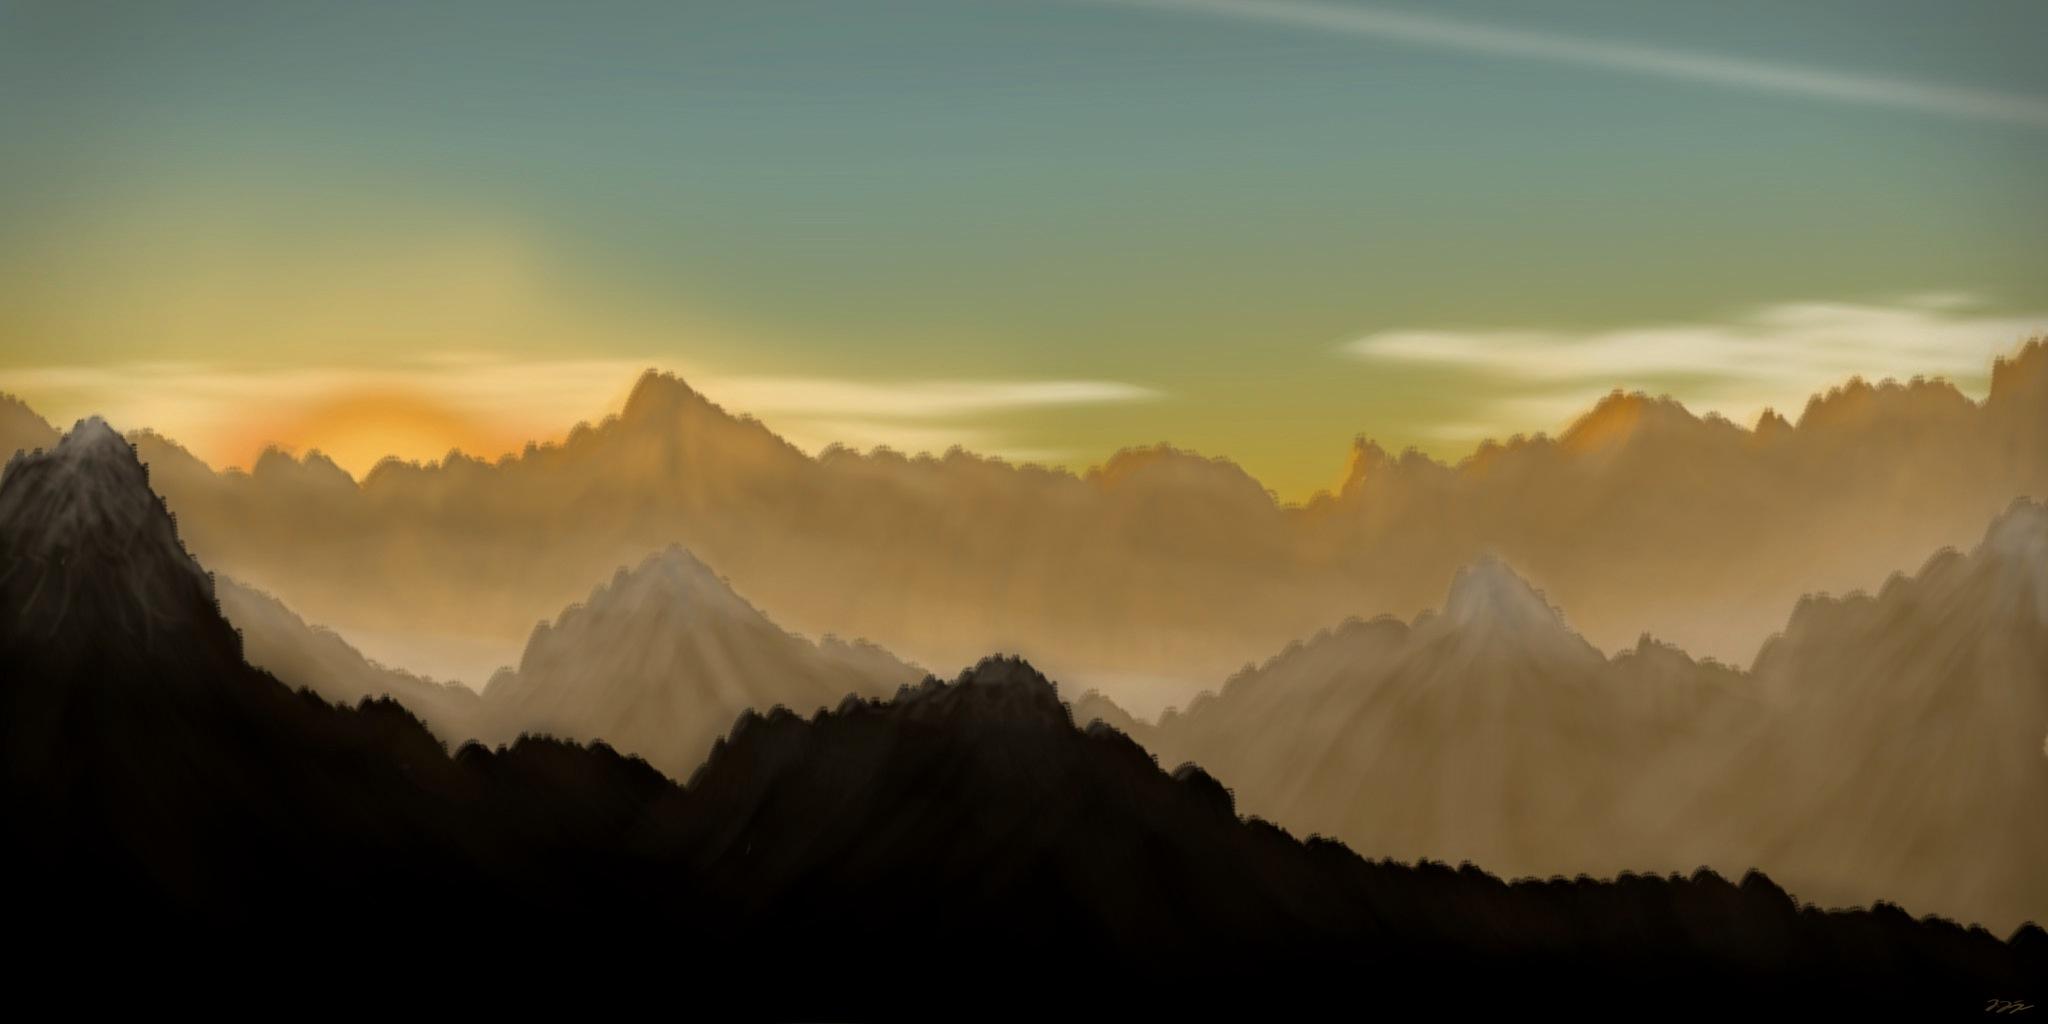 sunset hilly landscape by jonas jaeger on deviantart